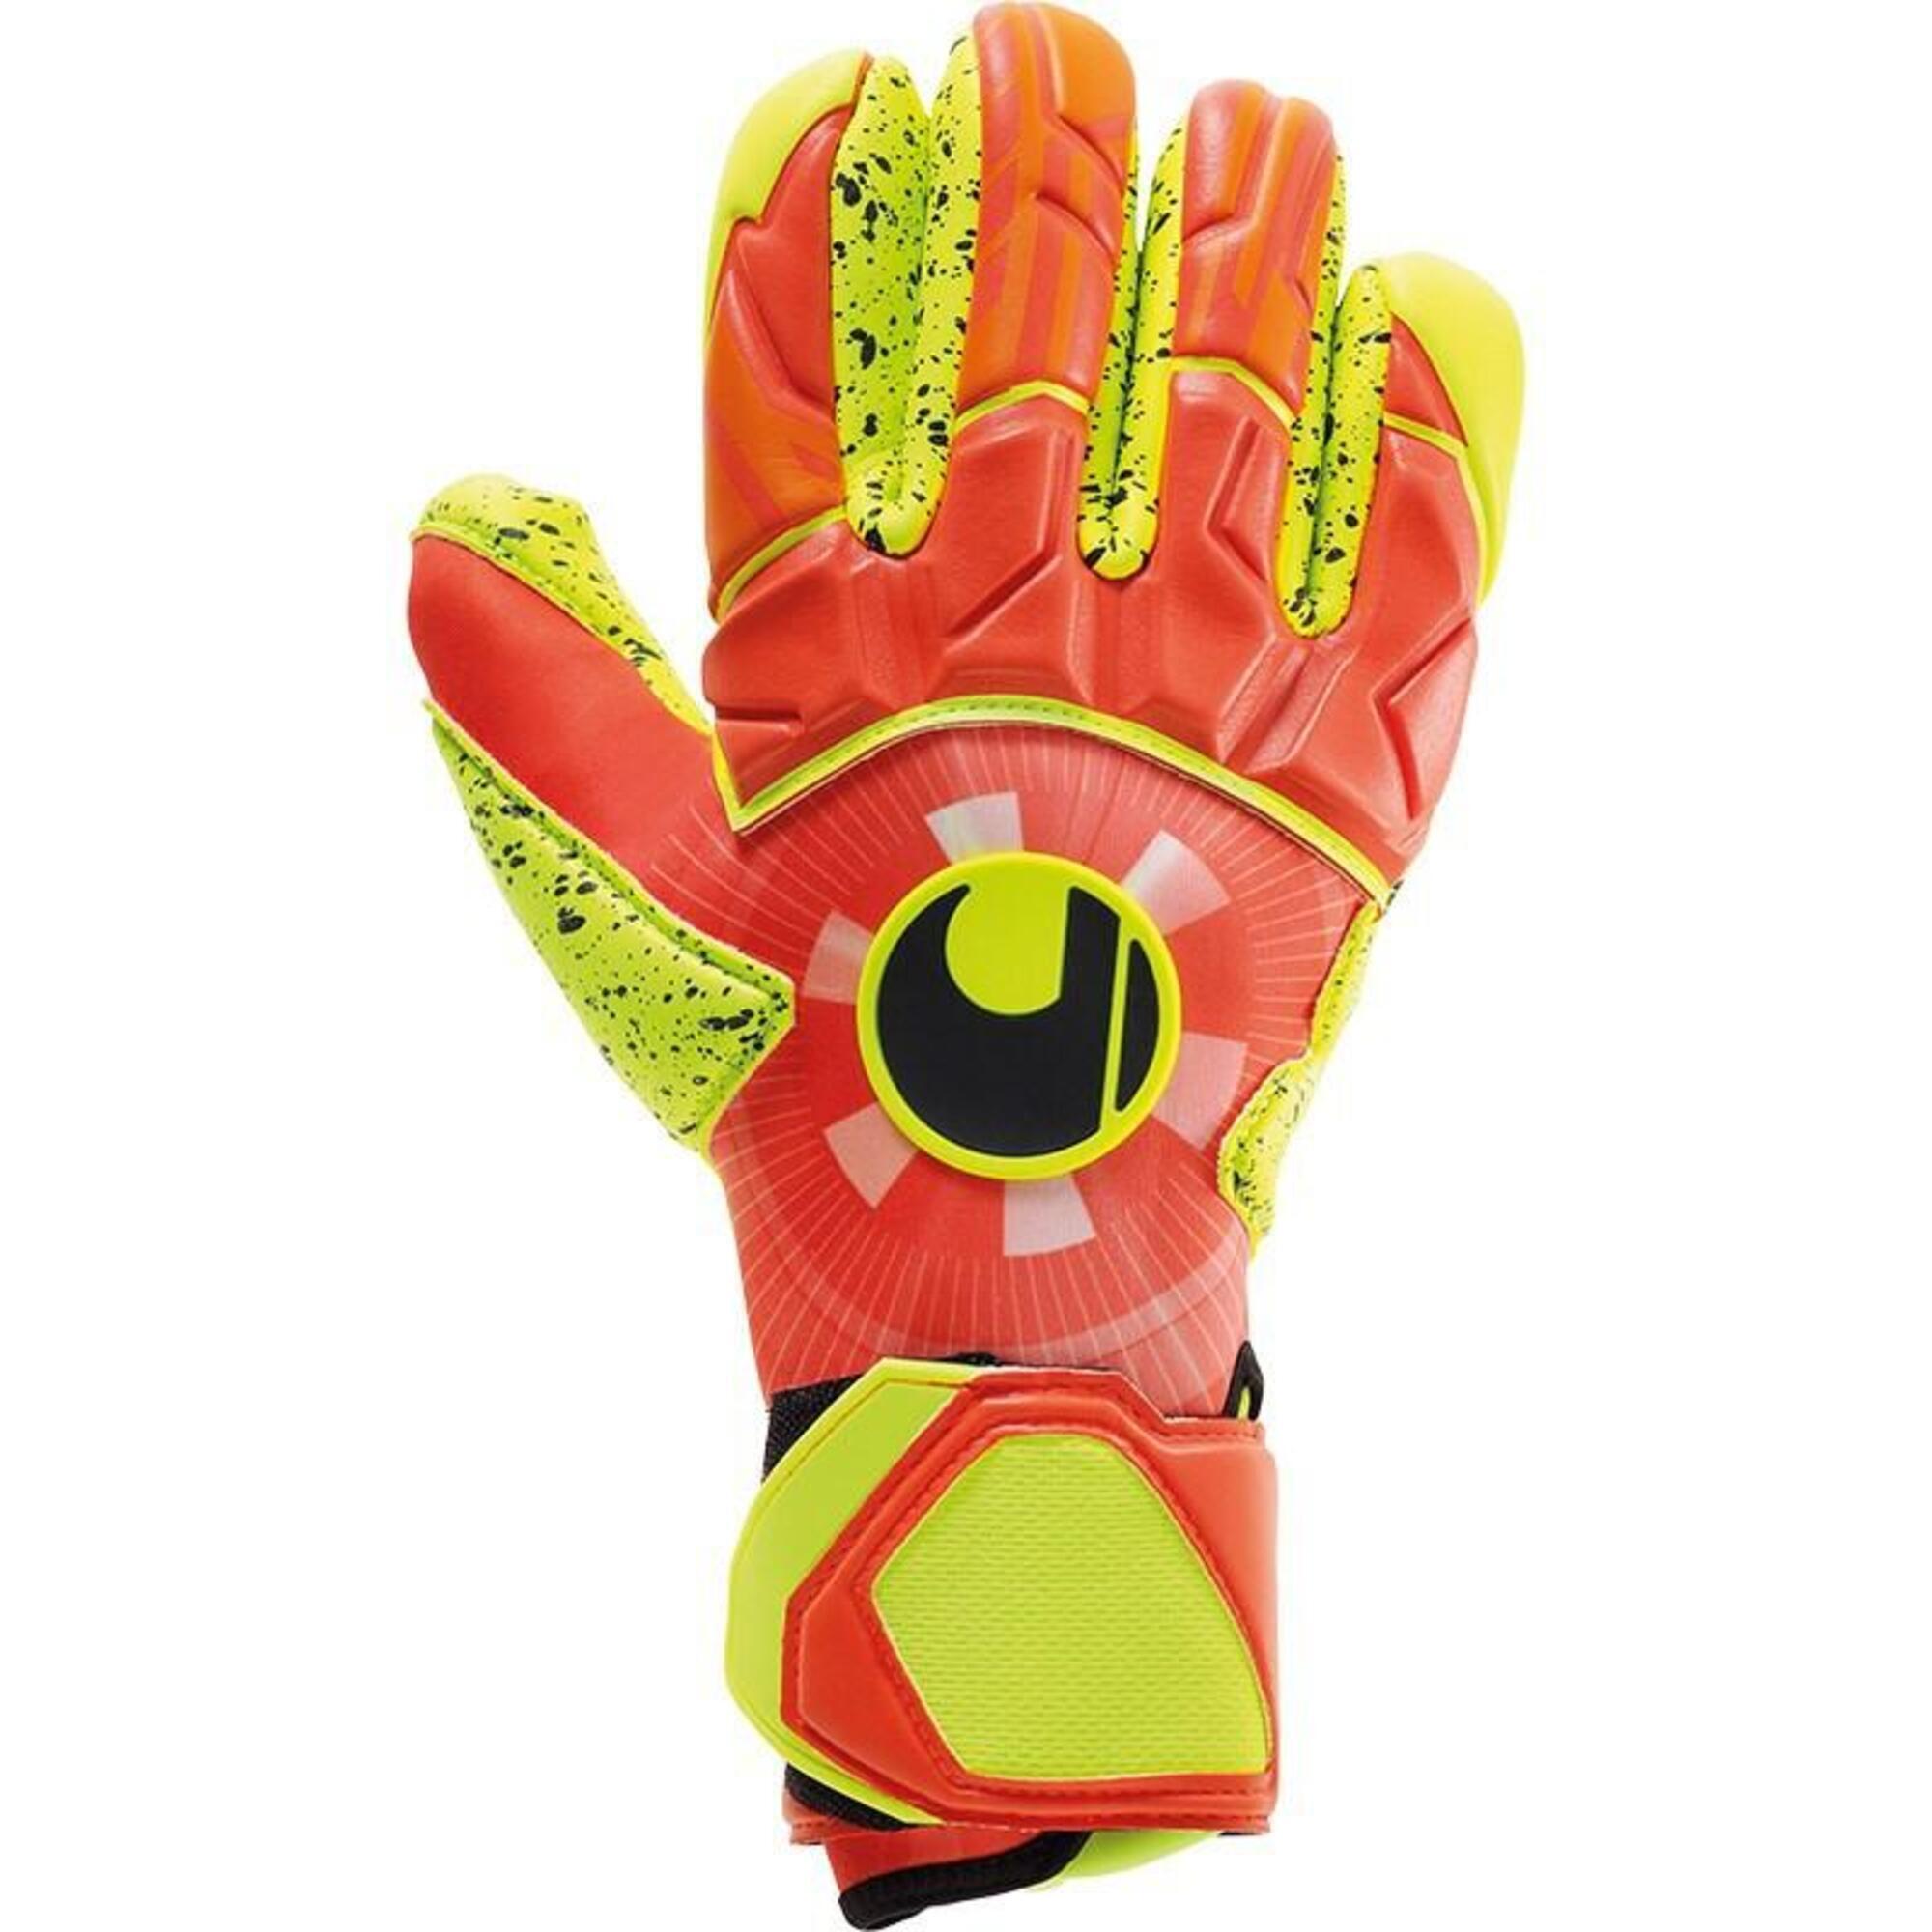 Gants de gardien Uhlsport Dynamic Impulse Supergr. Finger Surr.